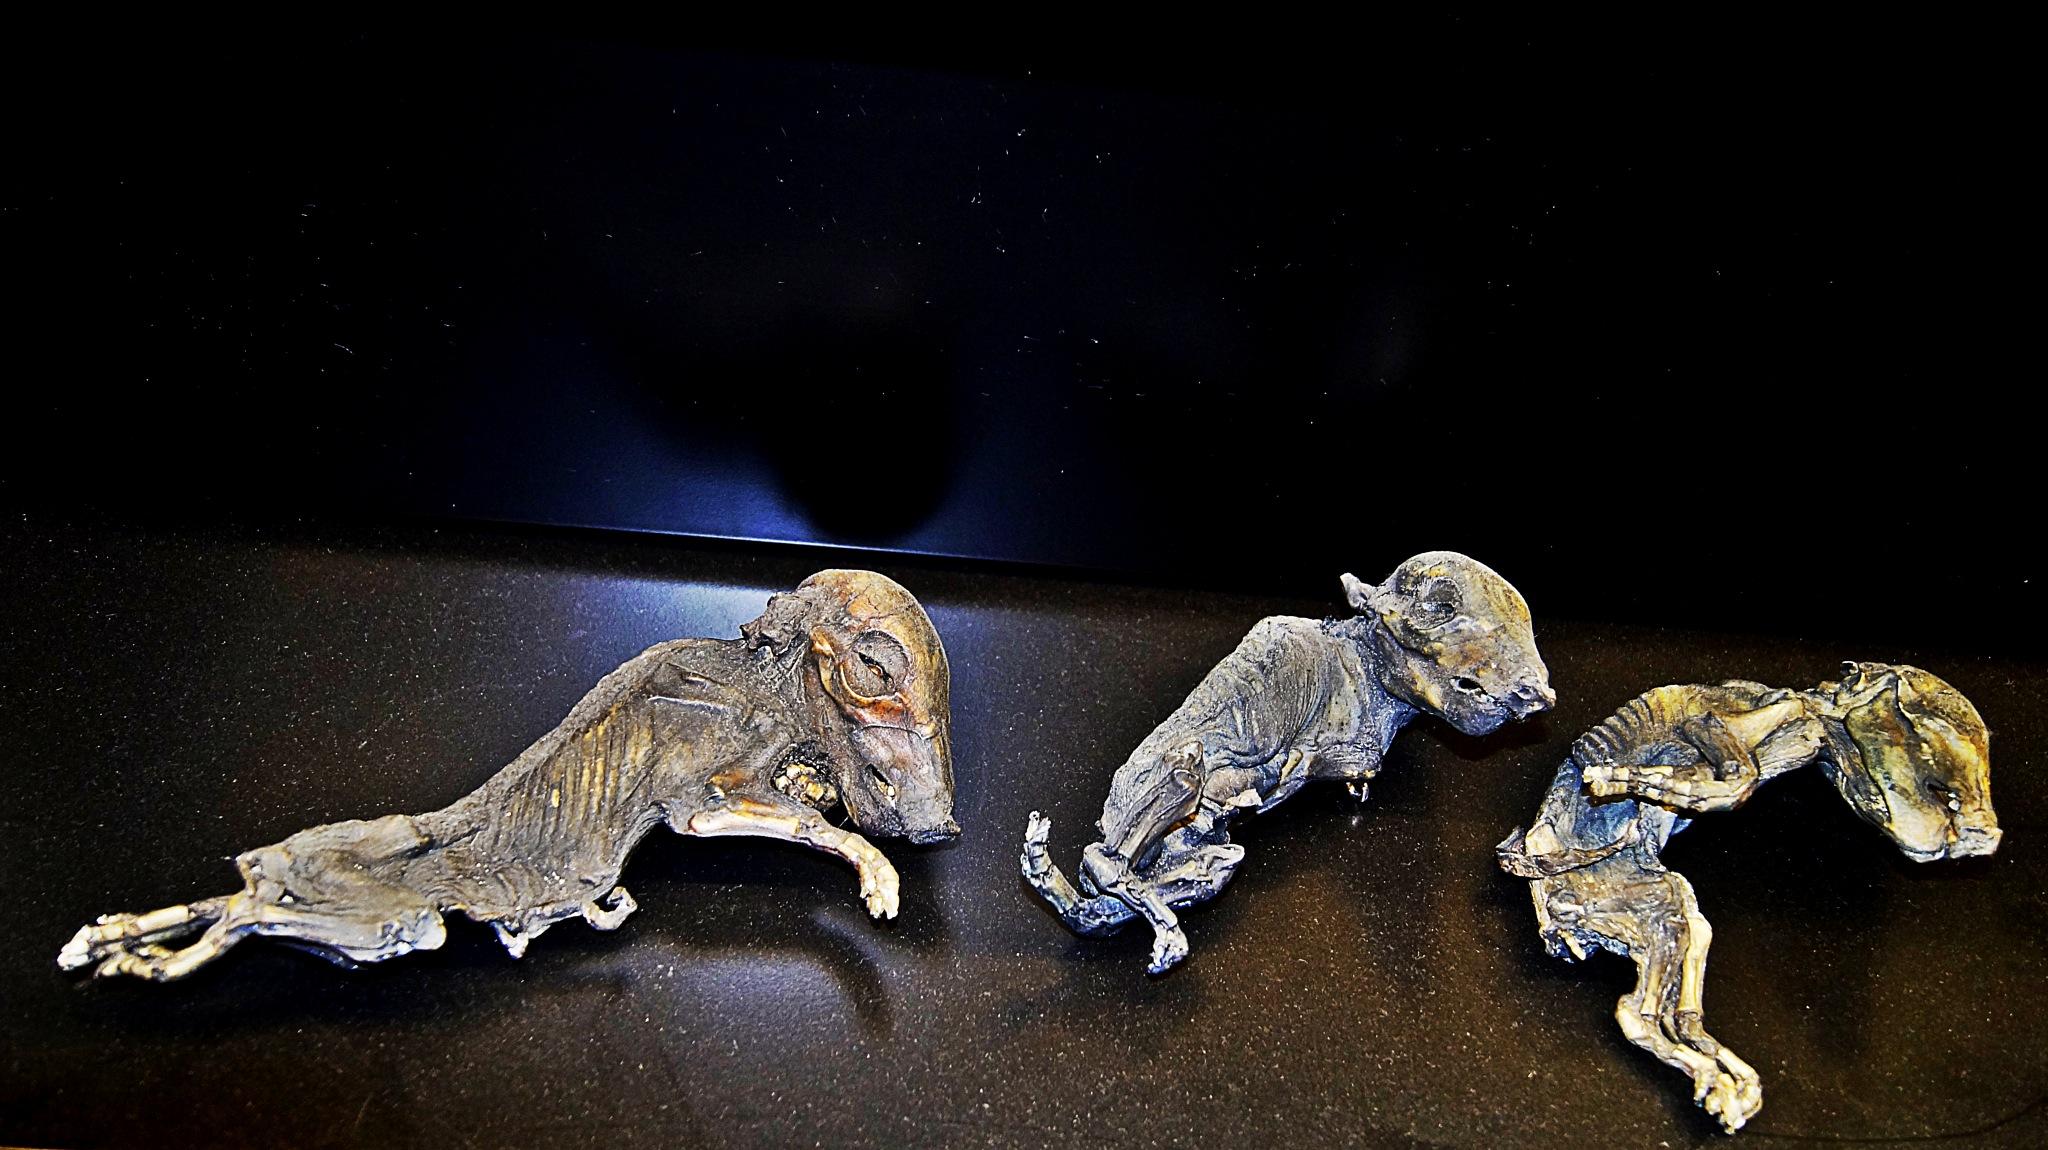 Mummified Embryos by hippymedia